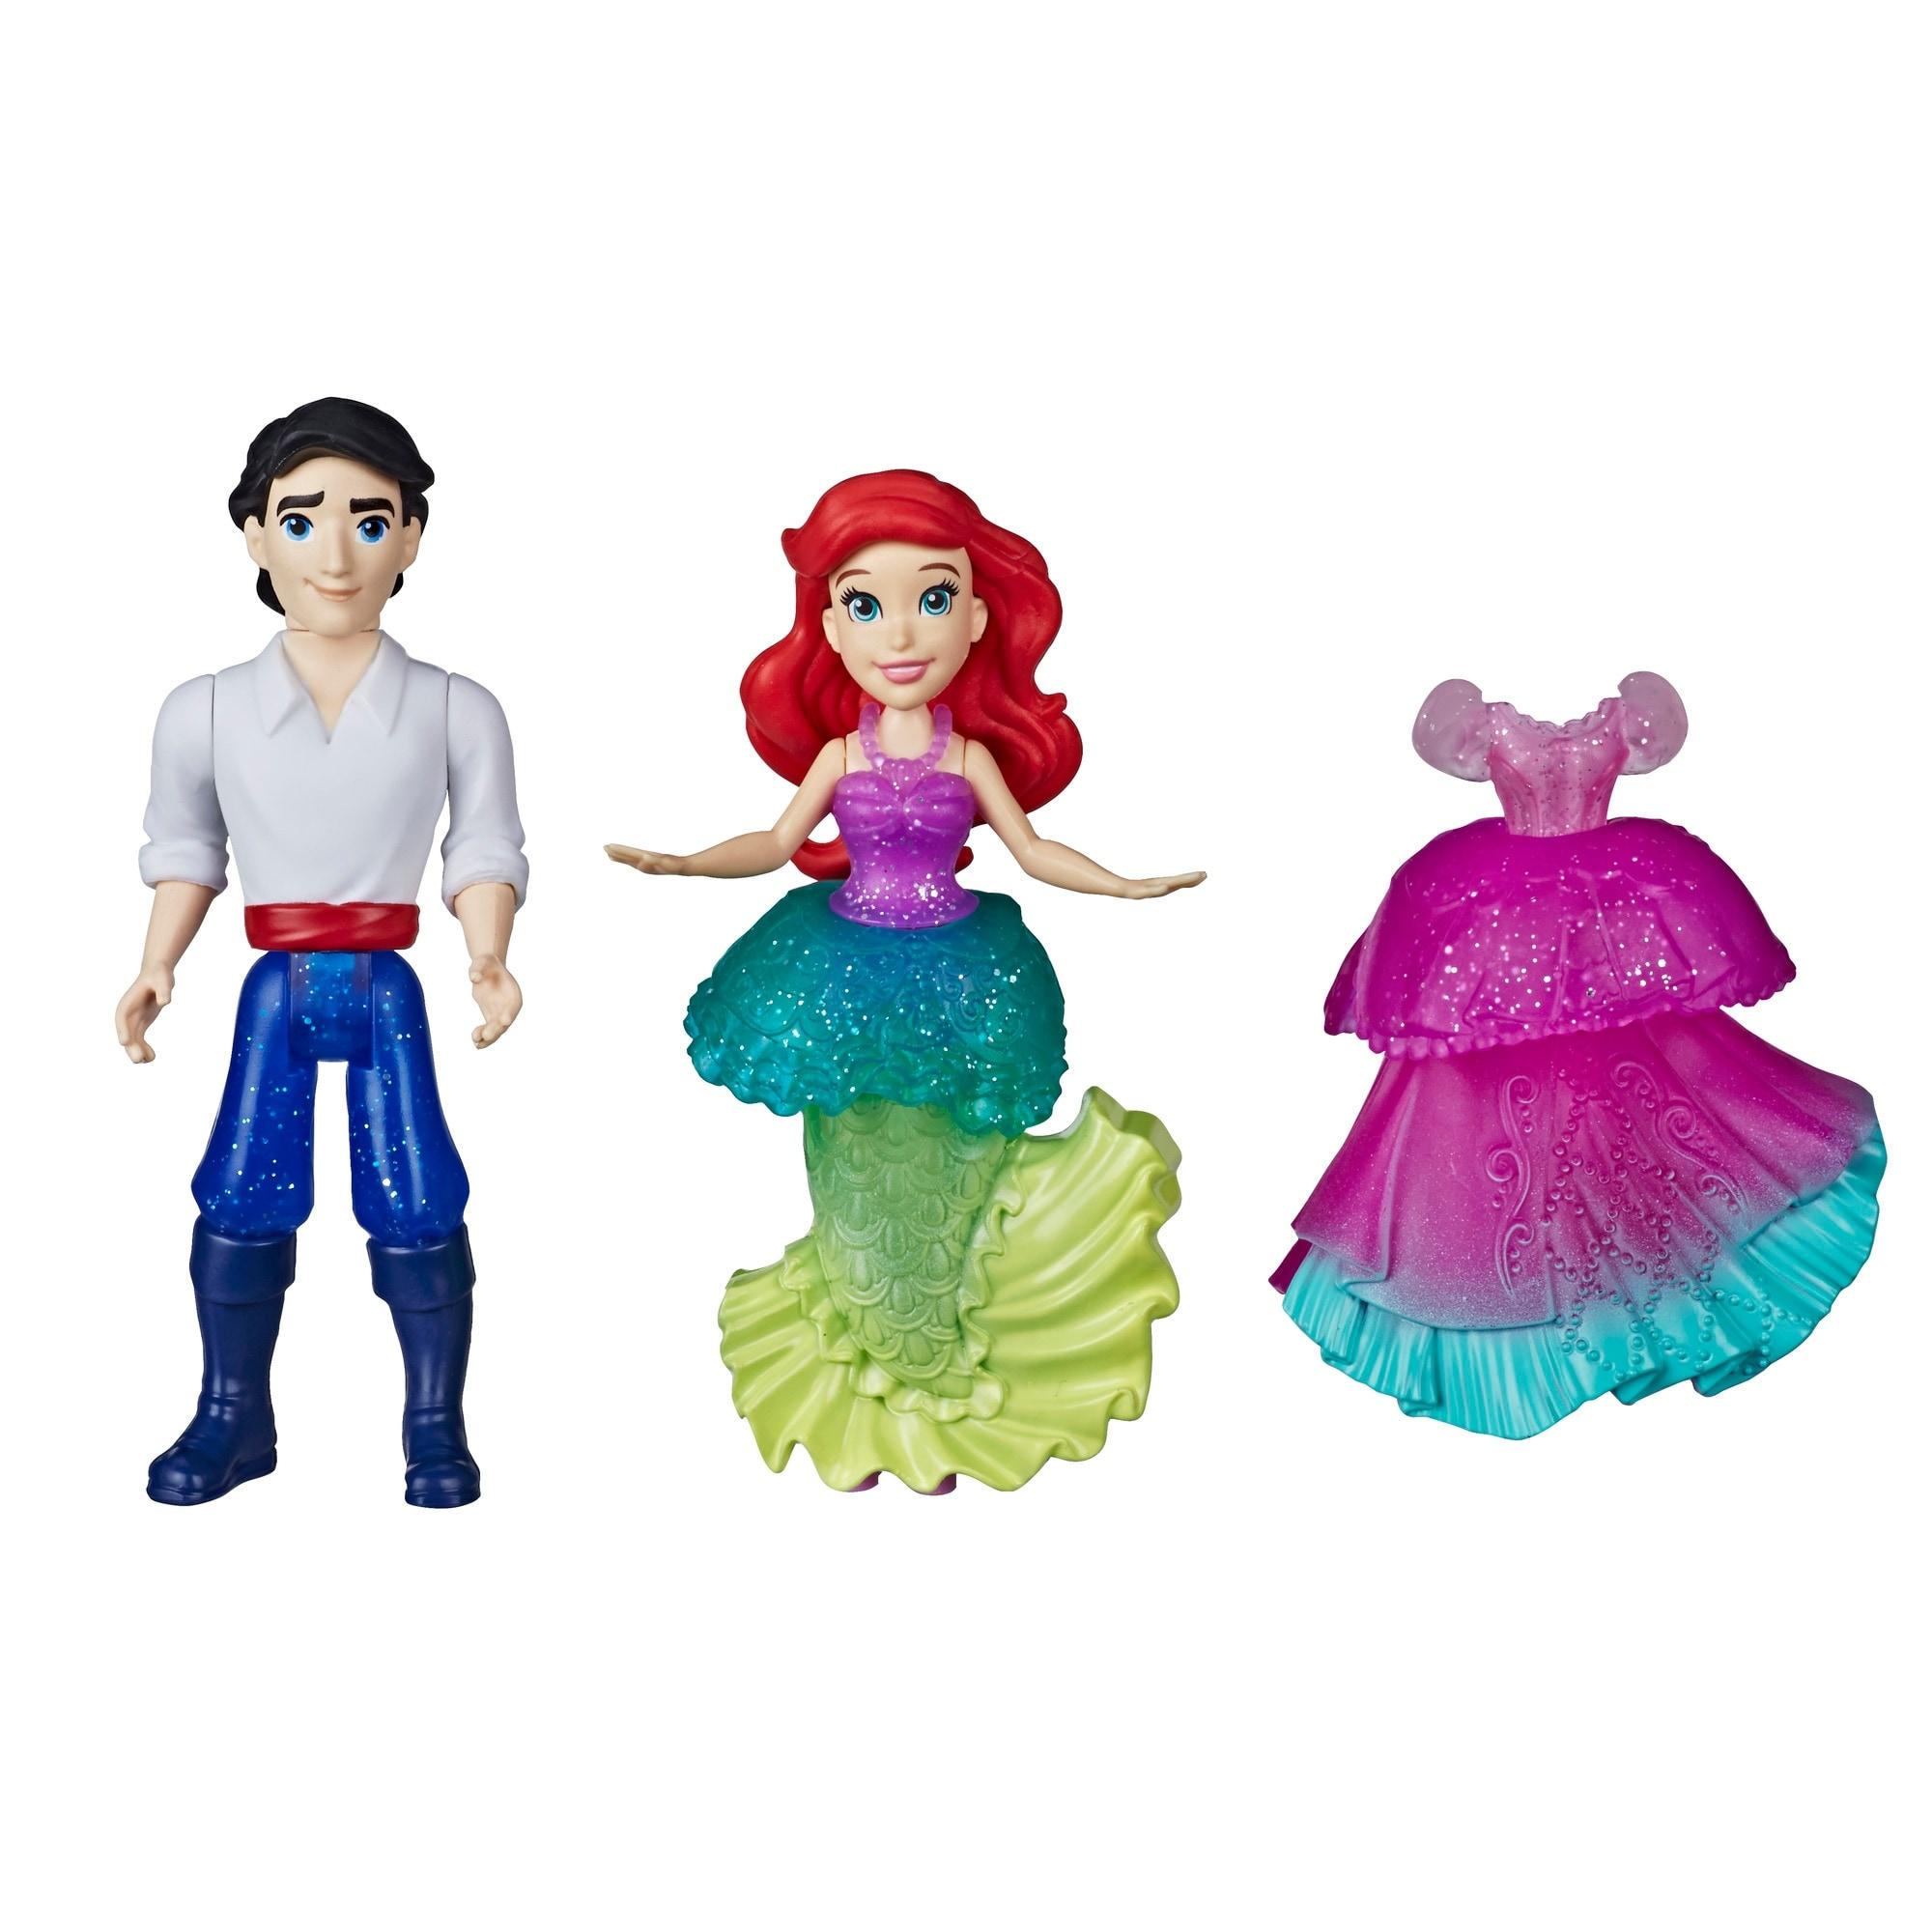 Shop Disney Princess Ariel And Prince Eric Collectible Small Doll